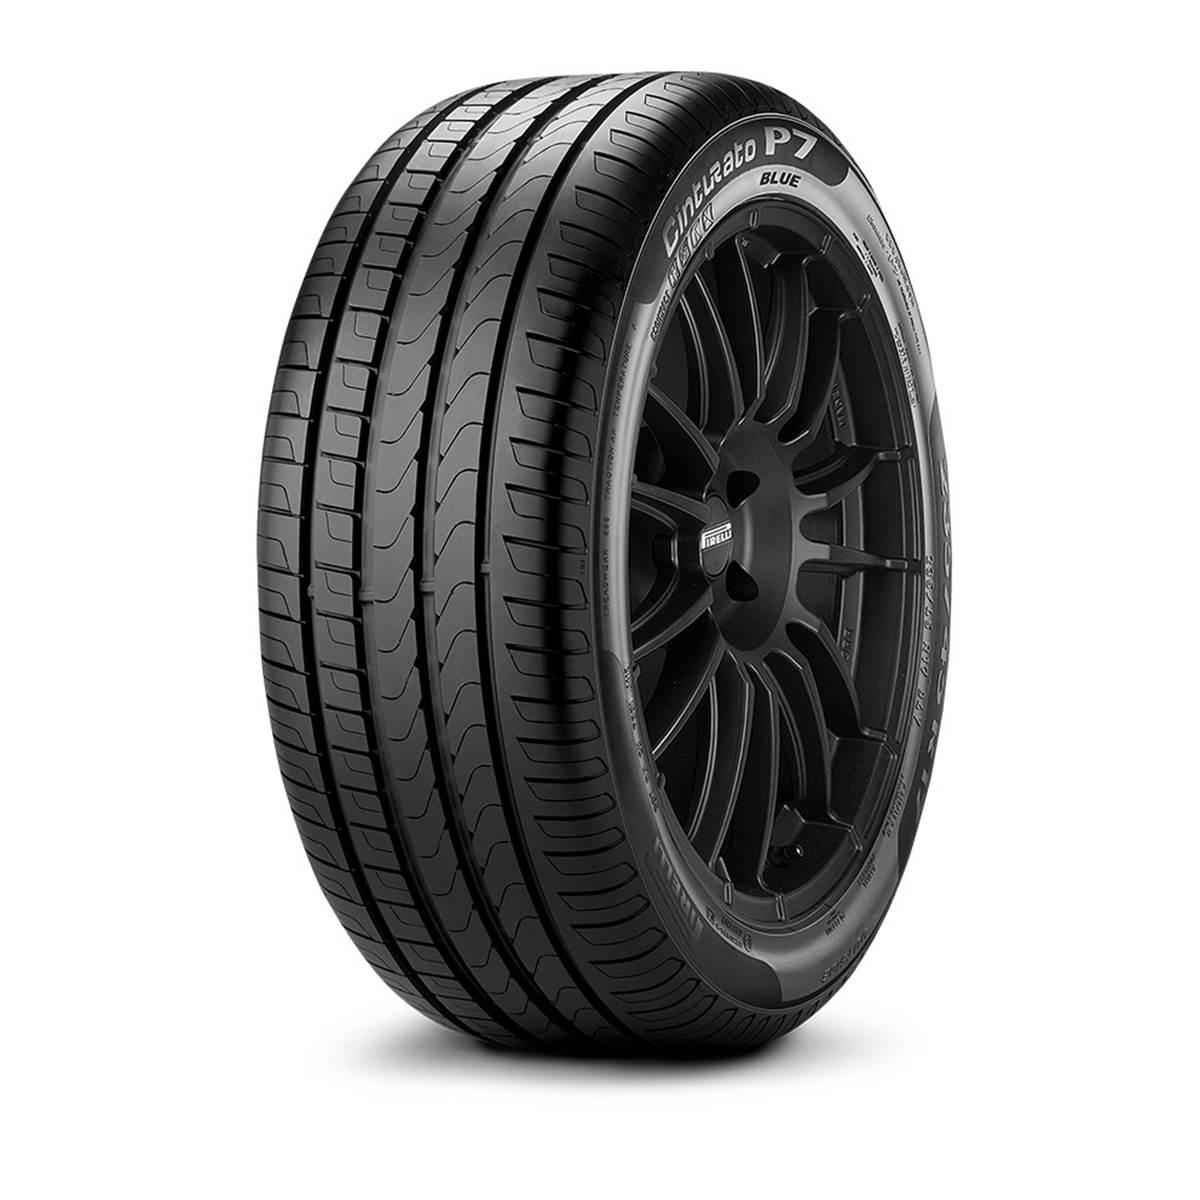 Pneu Pirelli 225/55R16 99W Cinturato P7 Blue XL